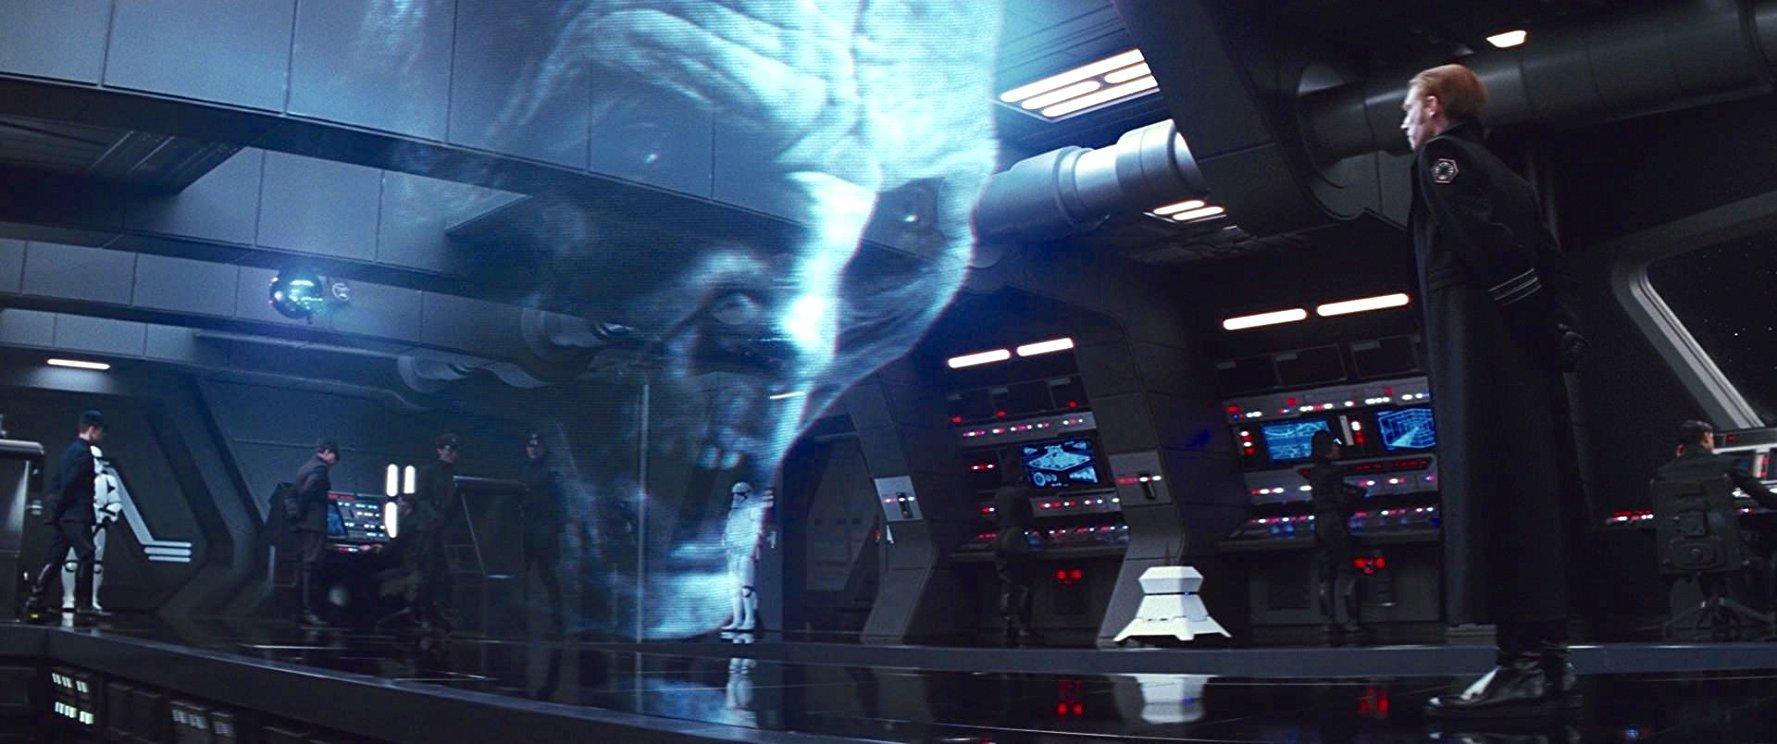 Star Wars - Snoke